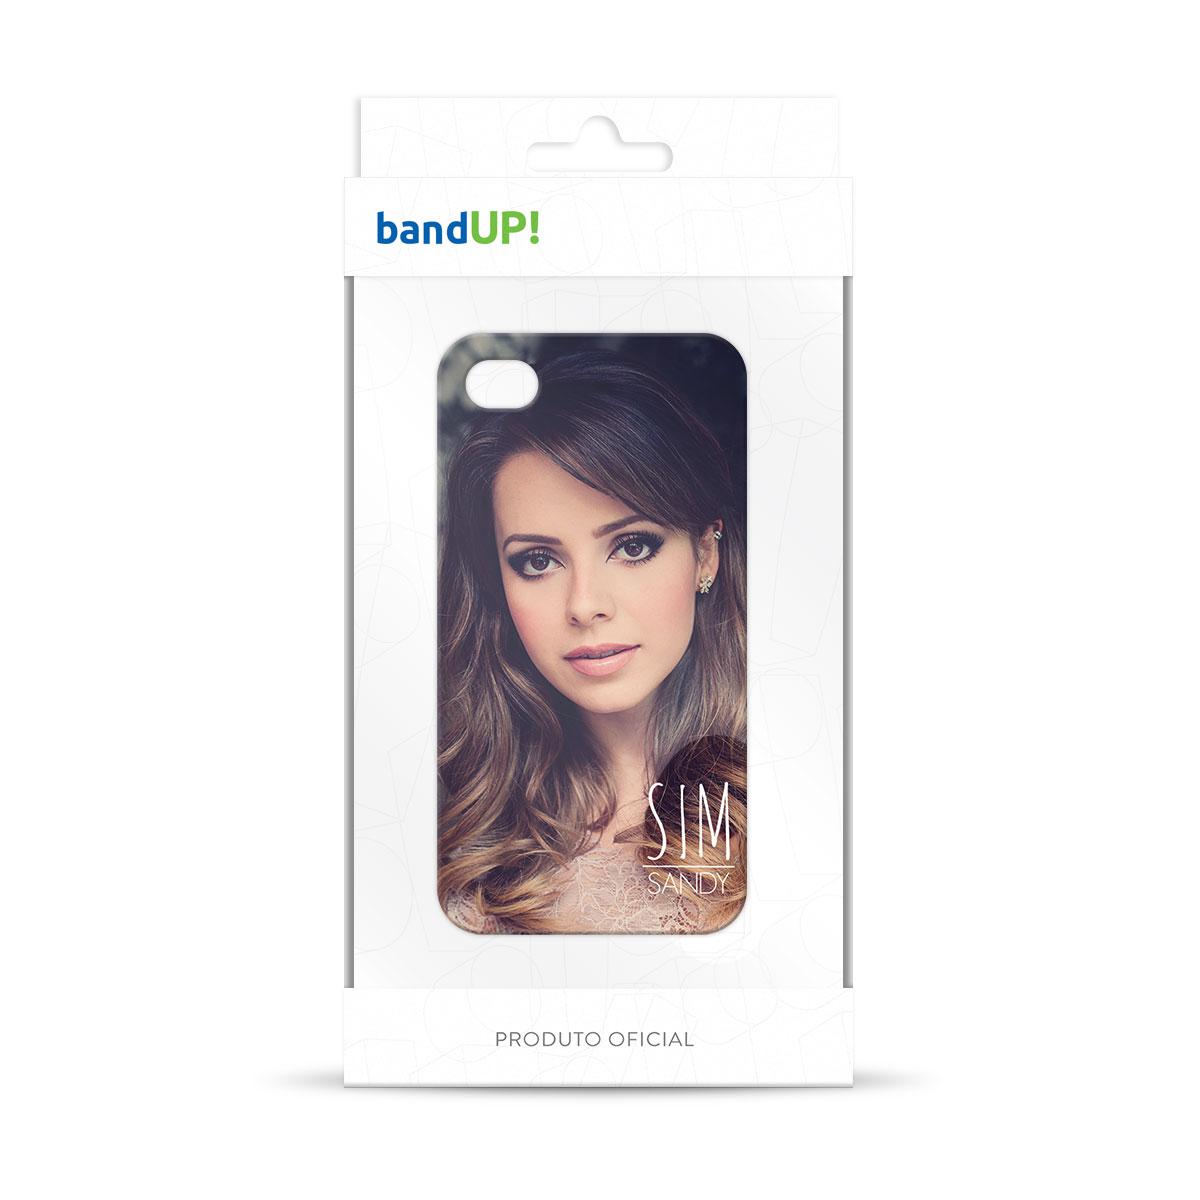 Capa de iPhone 4/4S Sandy Sim 2